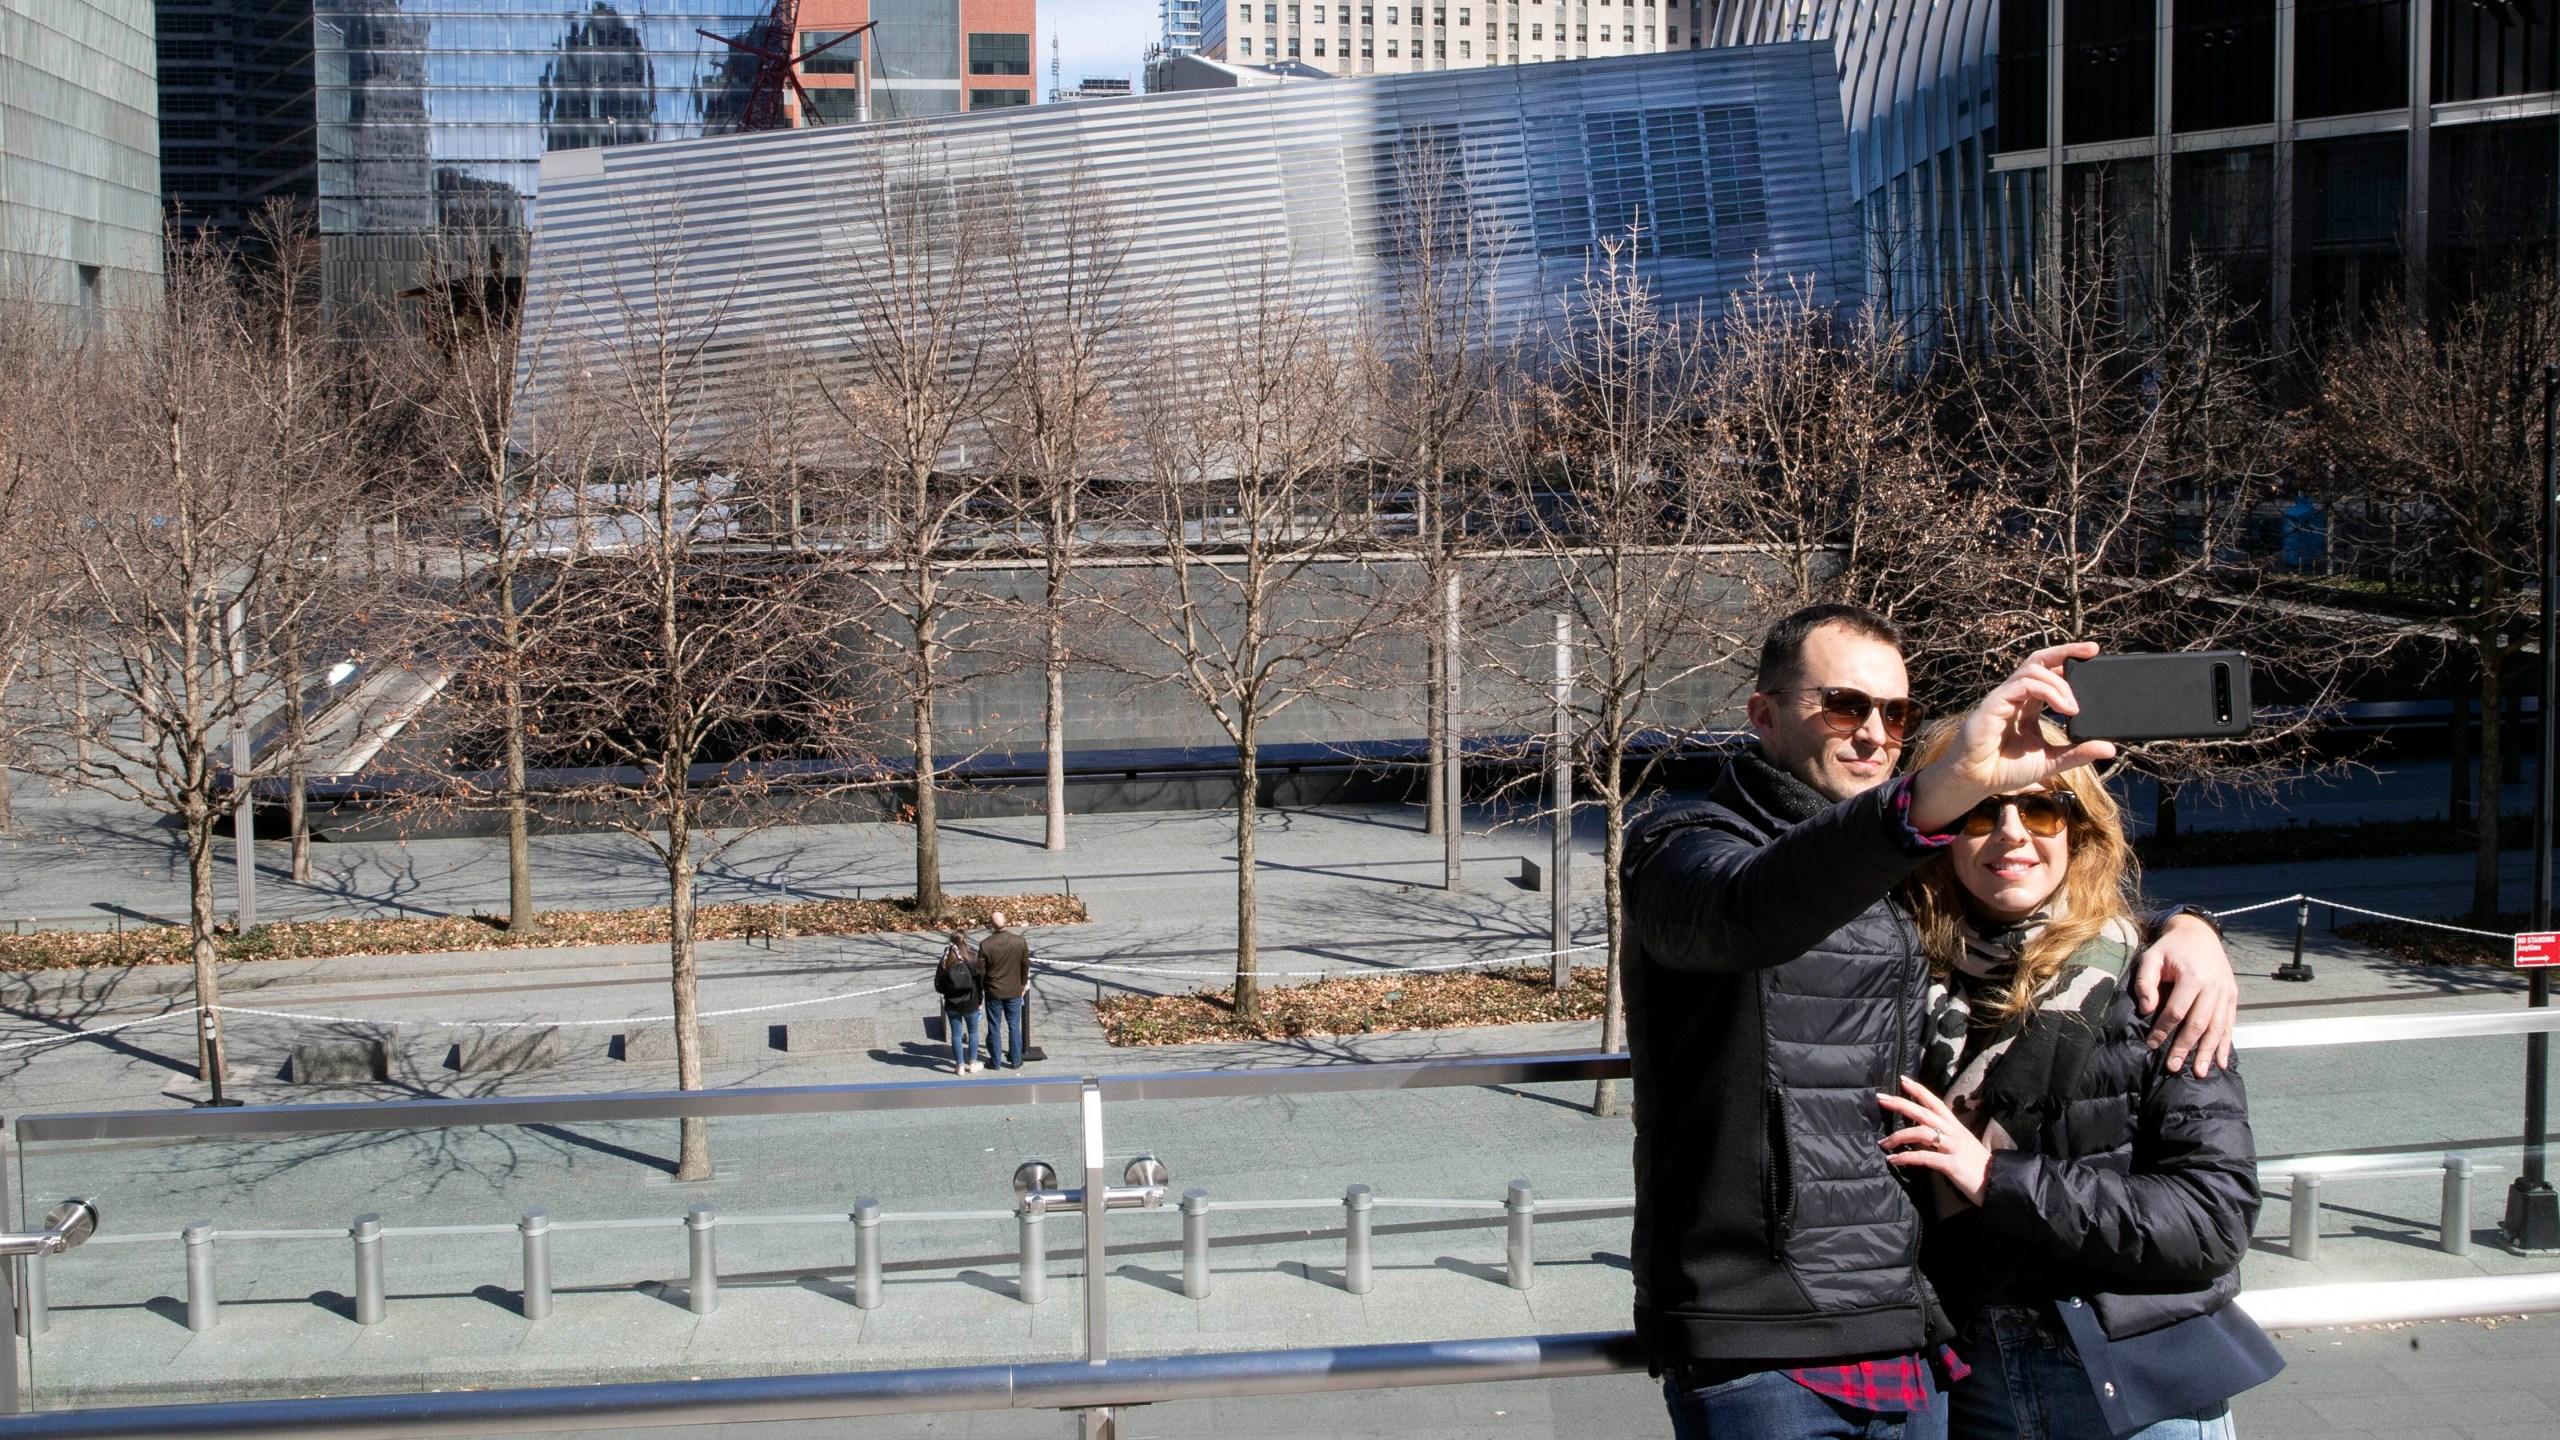 A selfie by the September 11 Memorial